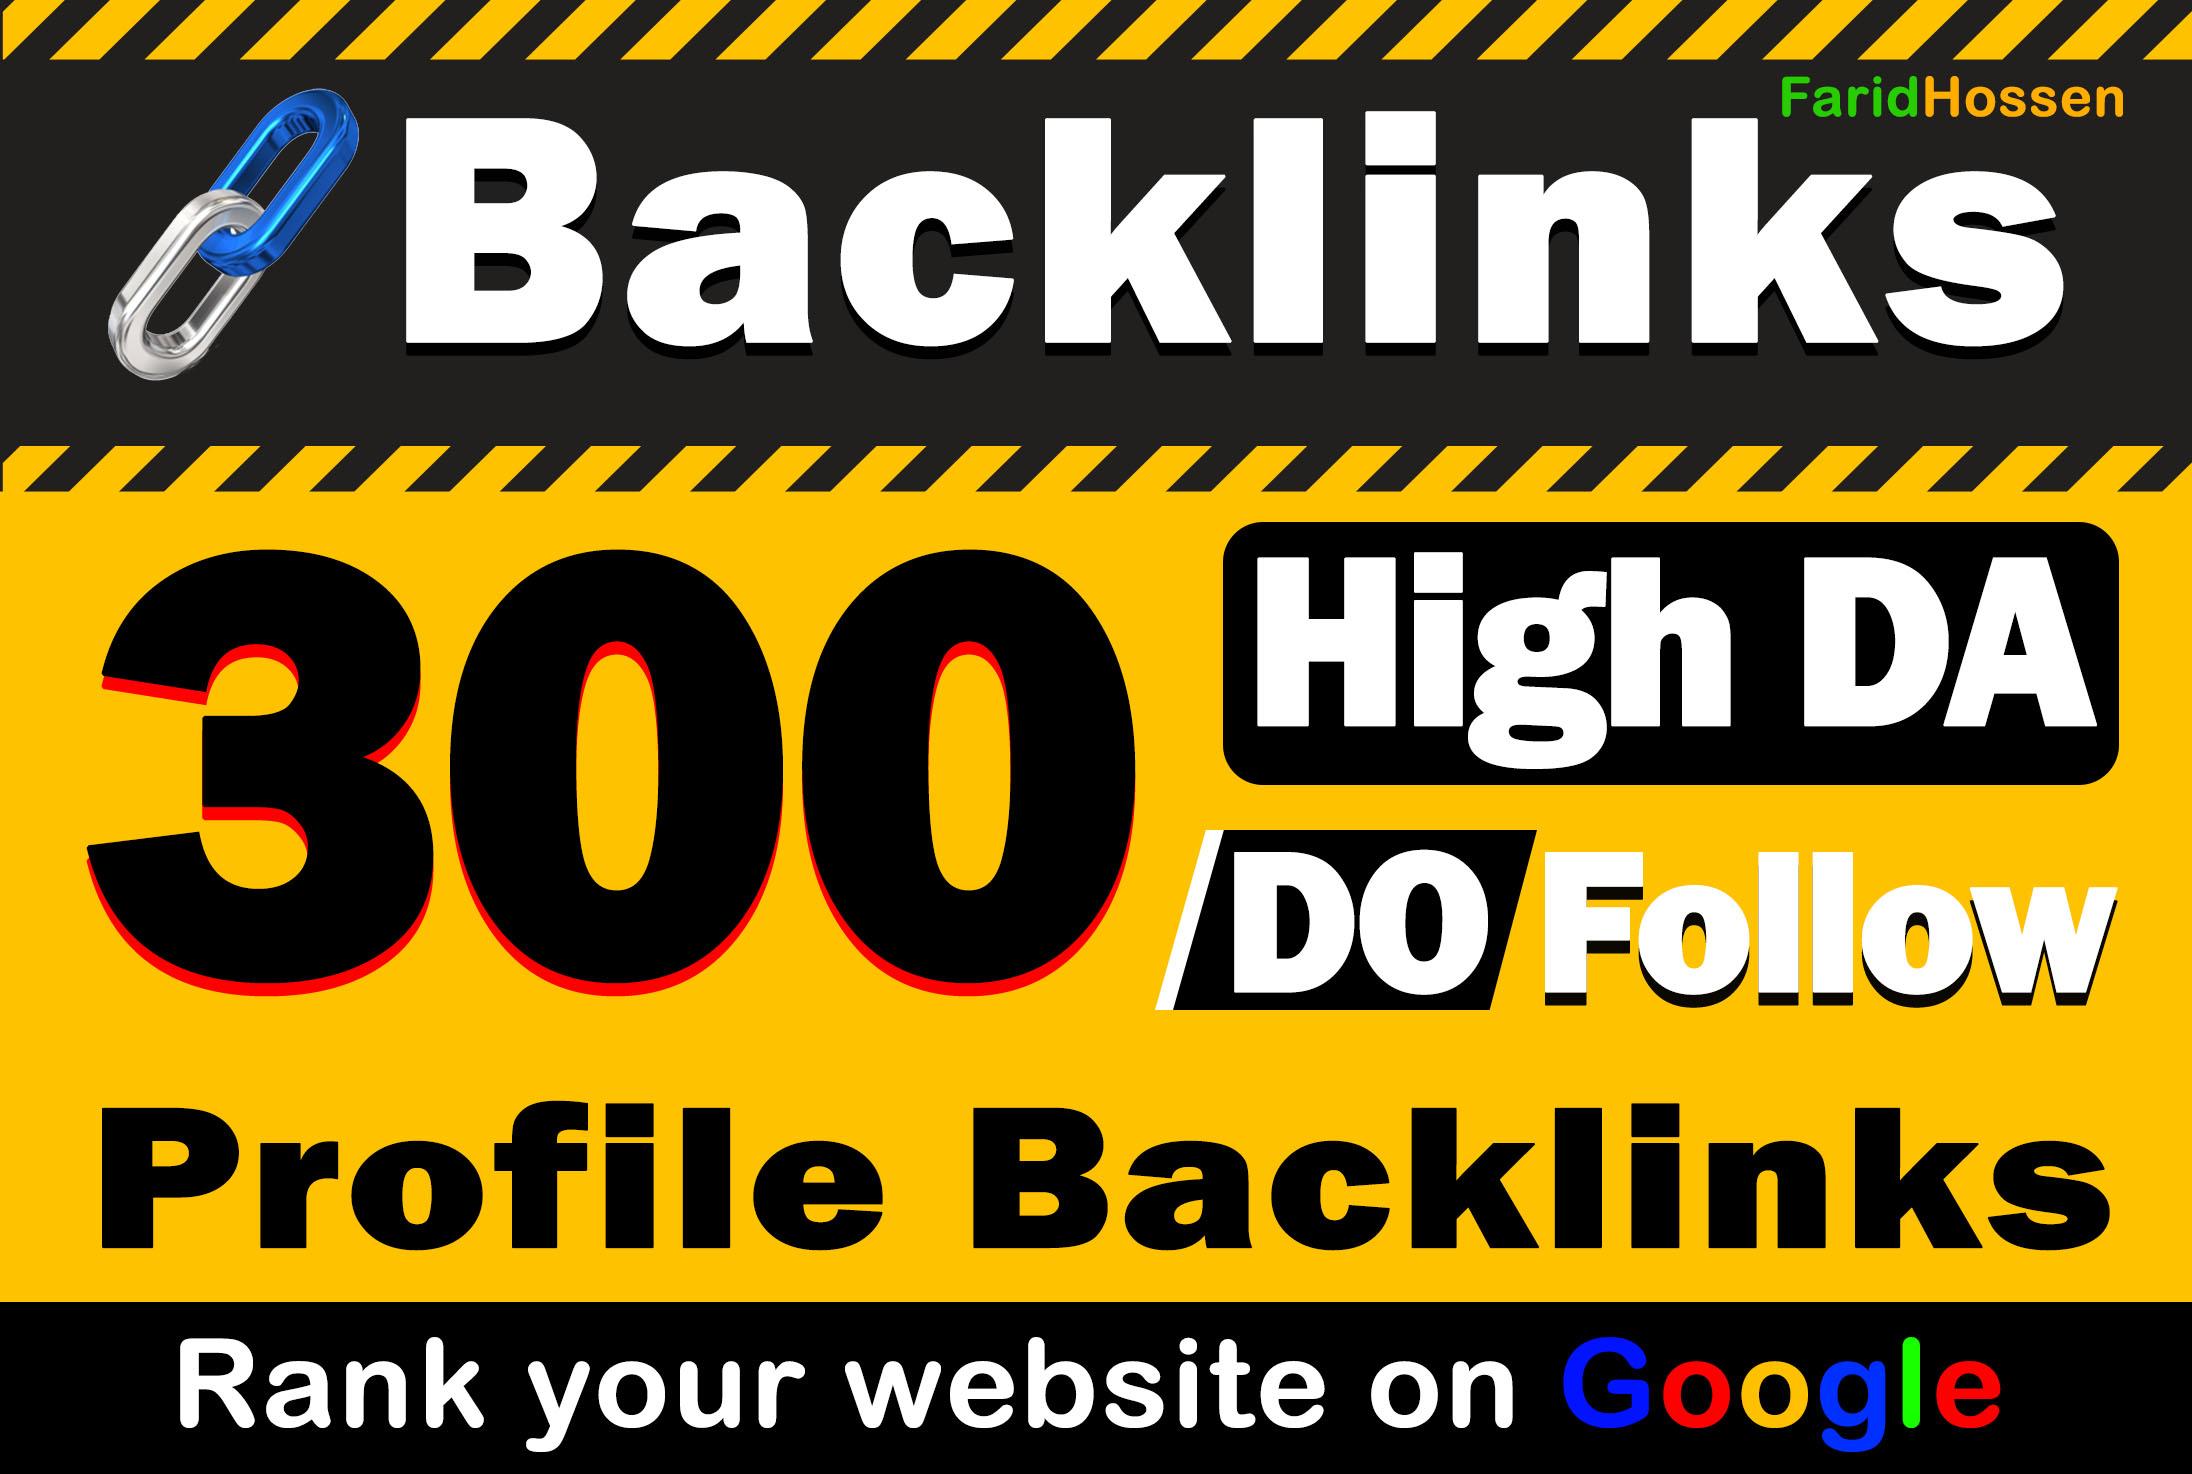 Manually 300 Profile Backlinks High DA, PA White Hat Permanent Do Follow Backlink